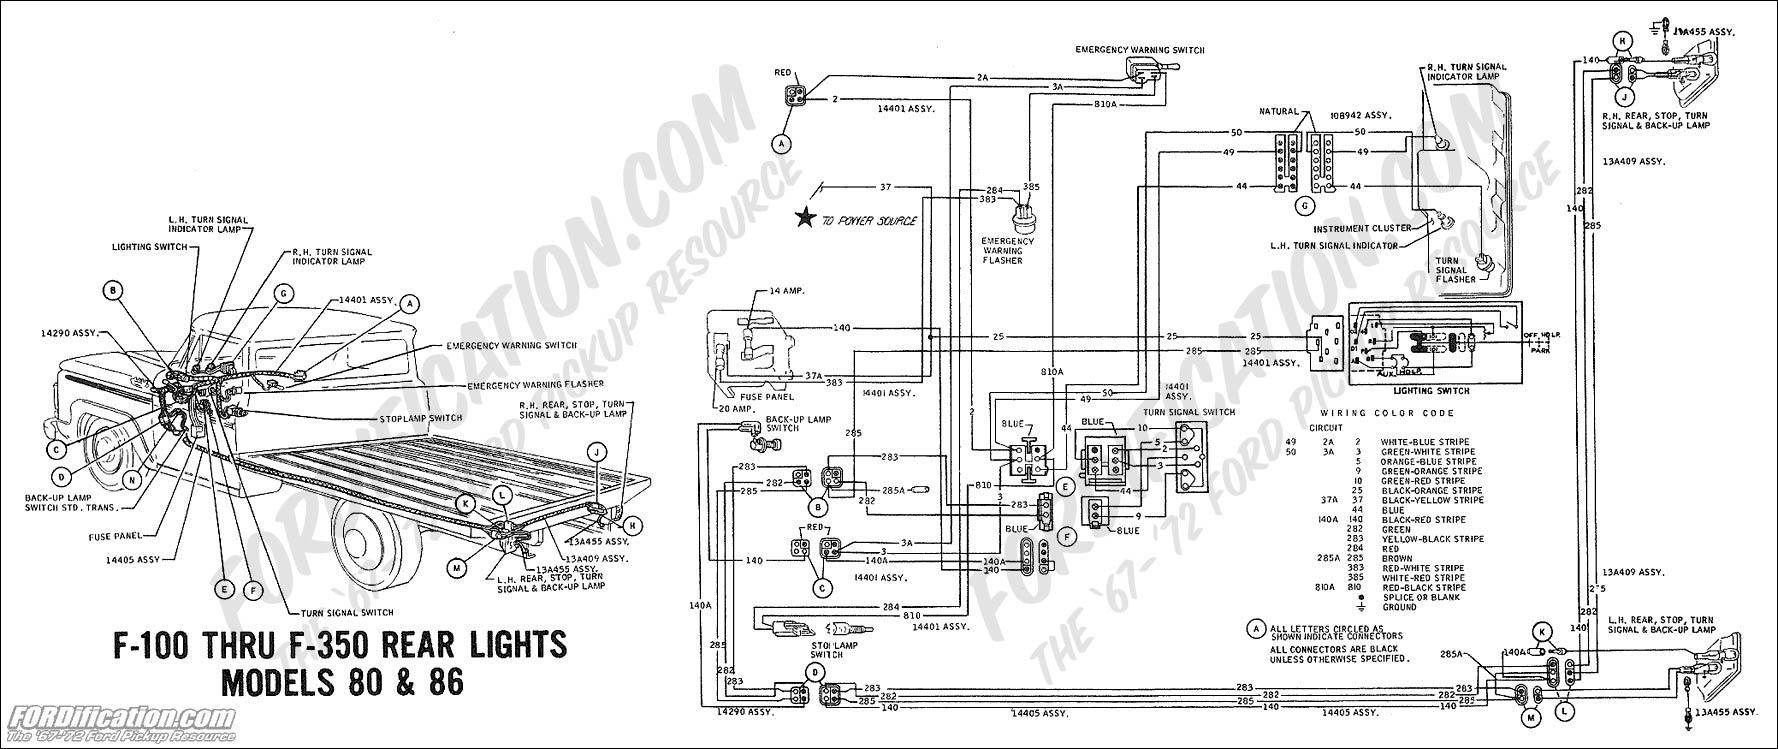 92 F150 Alternator Wiring Diagram / 20 Awesome 1998 Ford